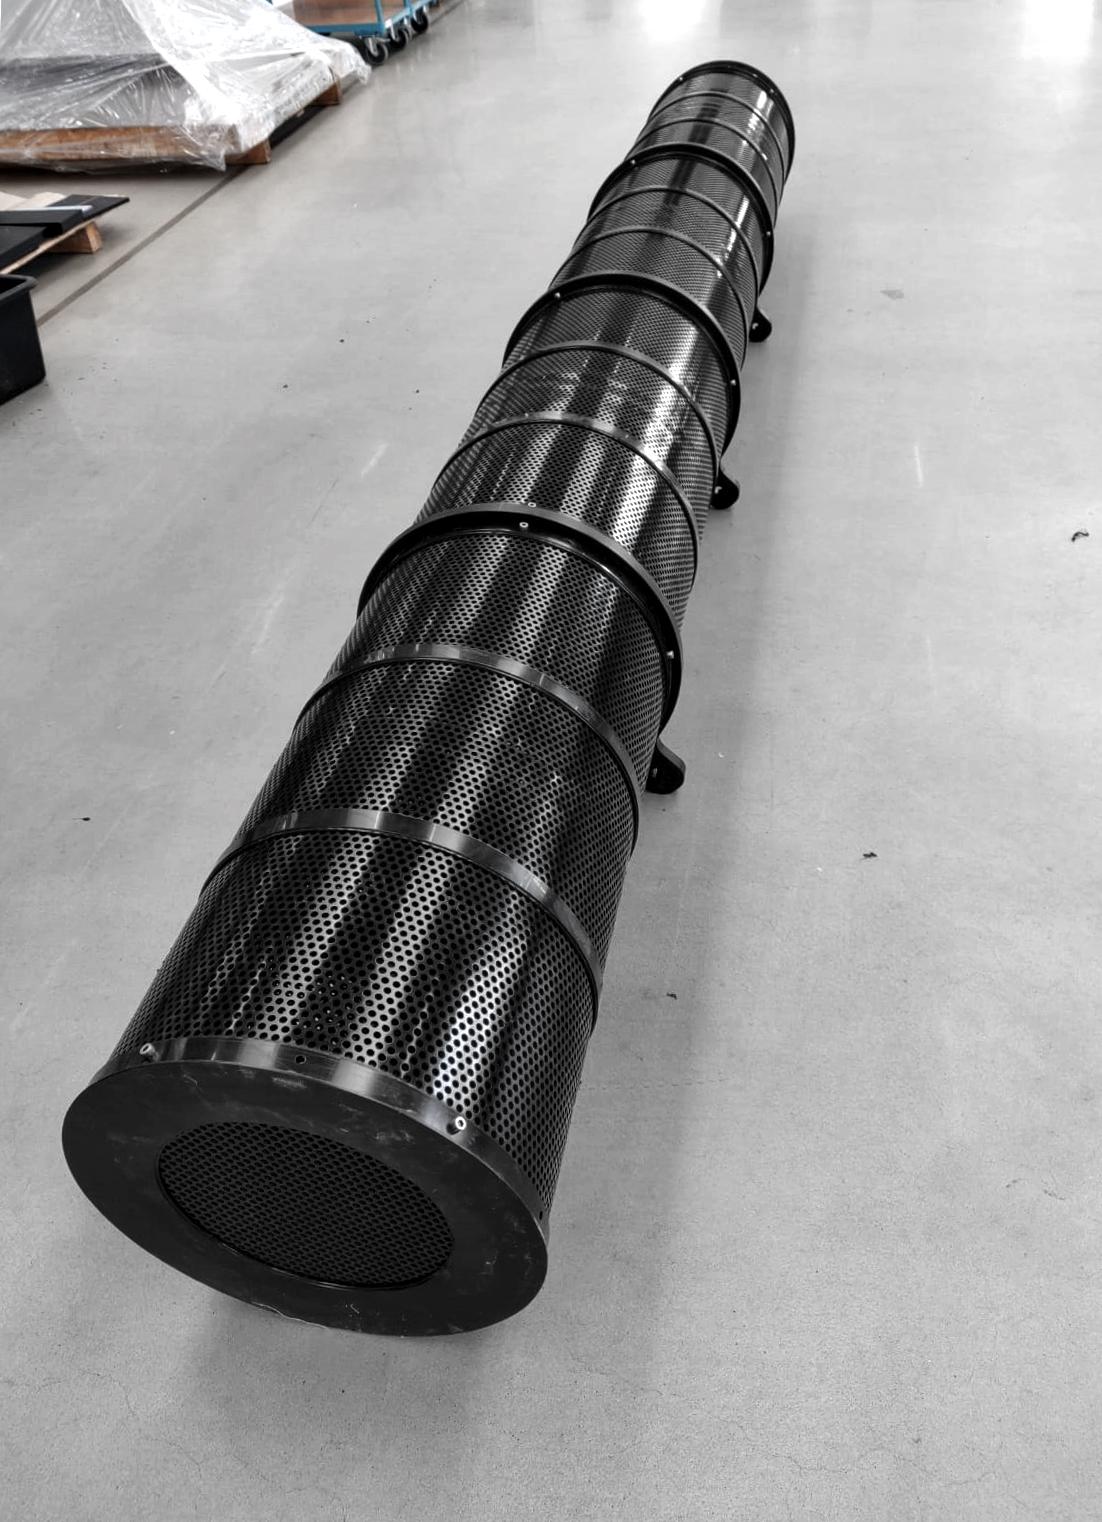 STC Trade Perfoplast Filter for seawater tanks fish